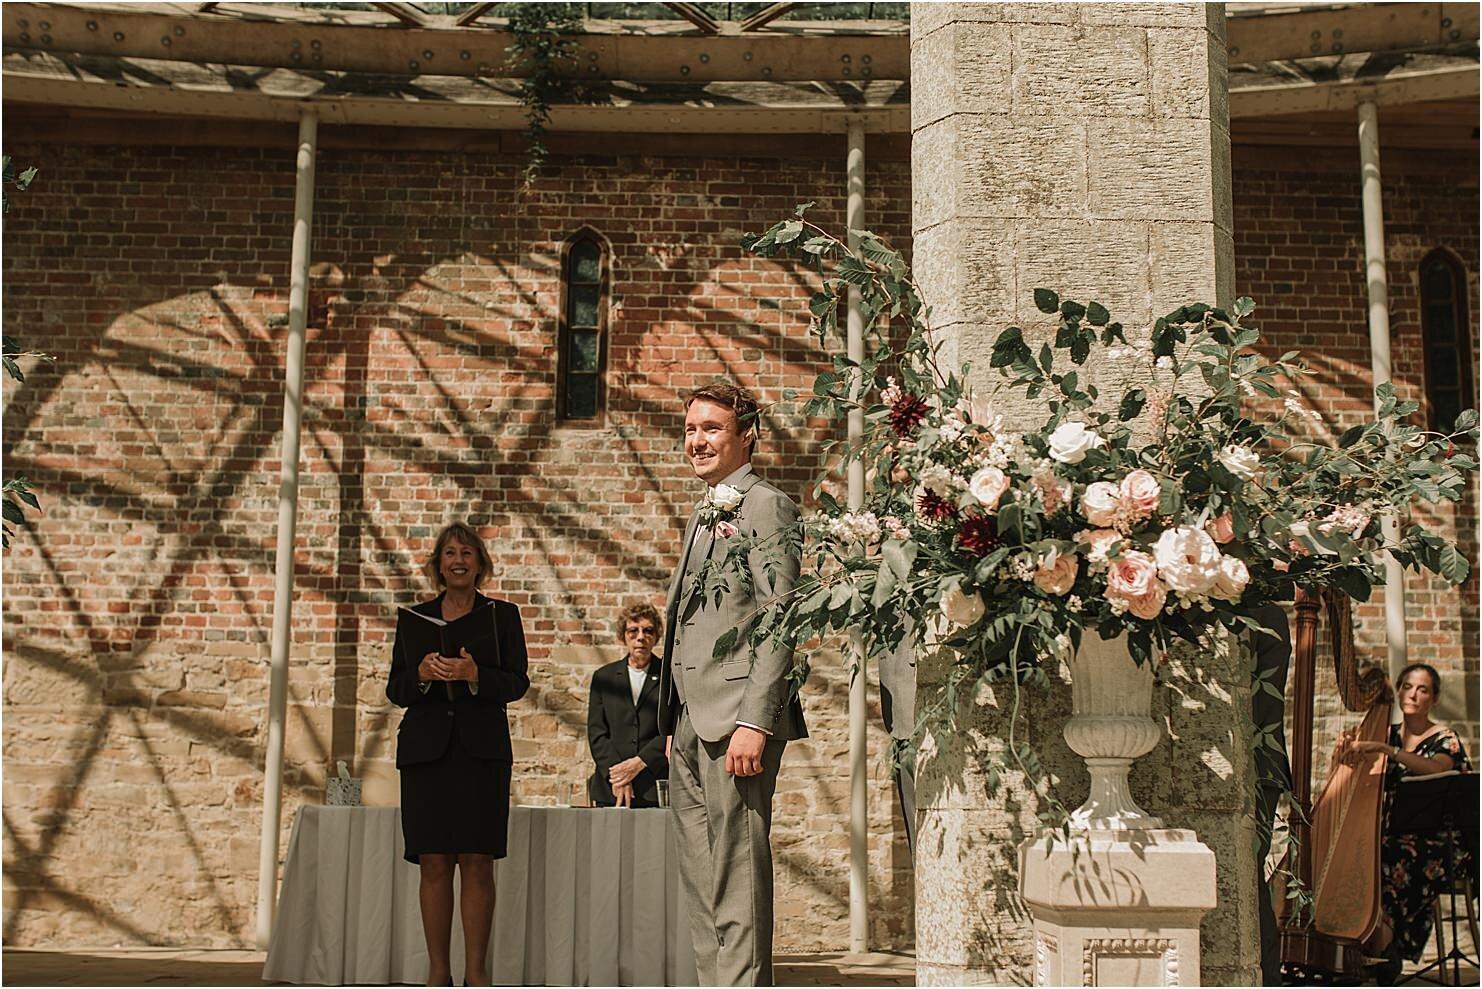 boda-de-cuento-en-castillo-boda-en-londres-50.jpg